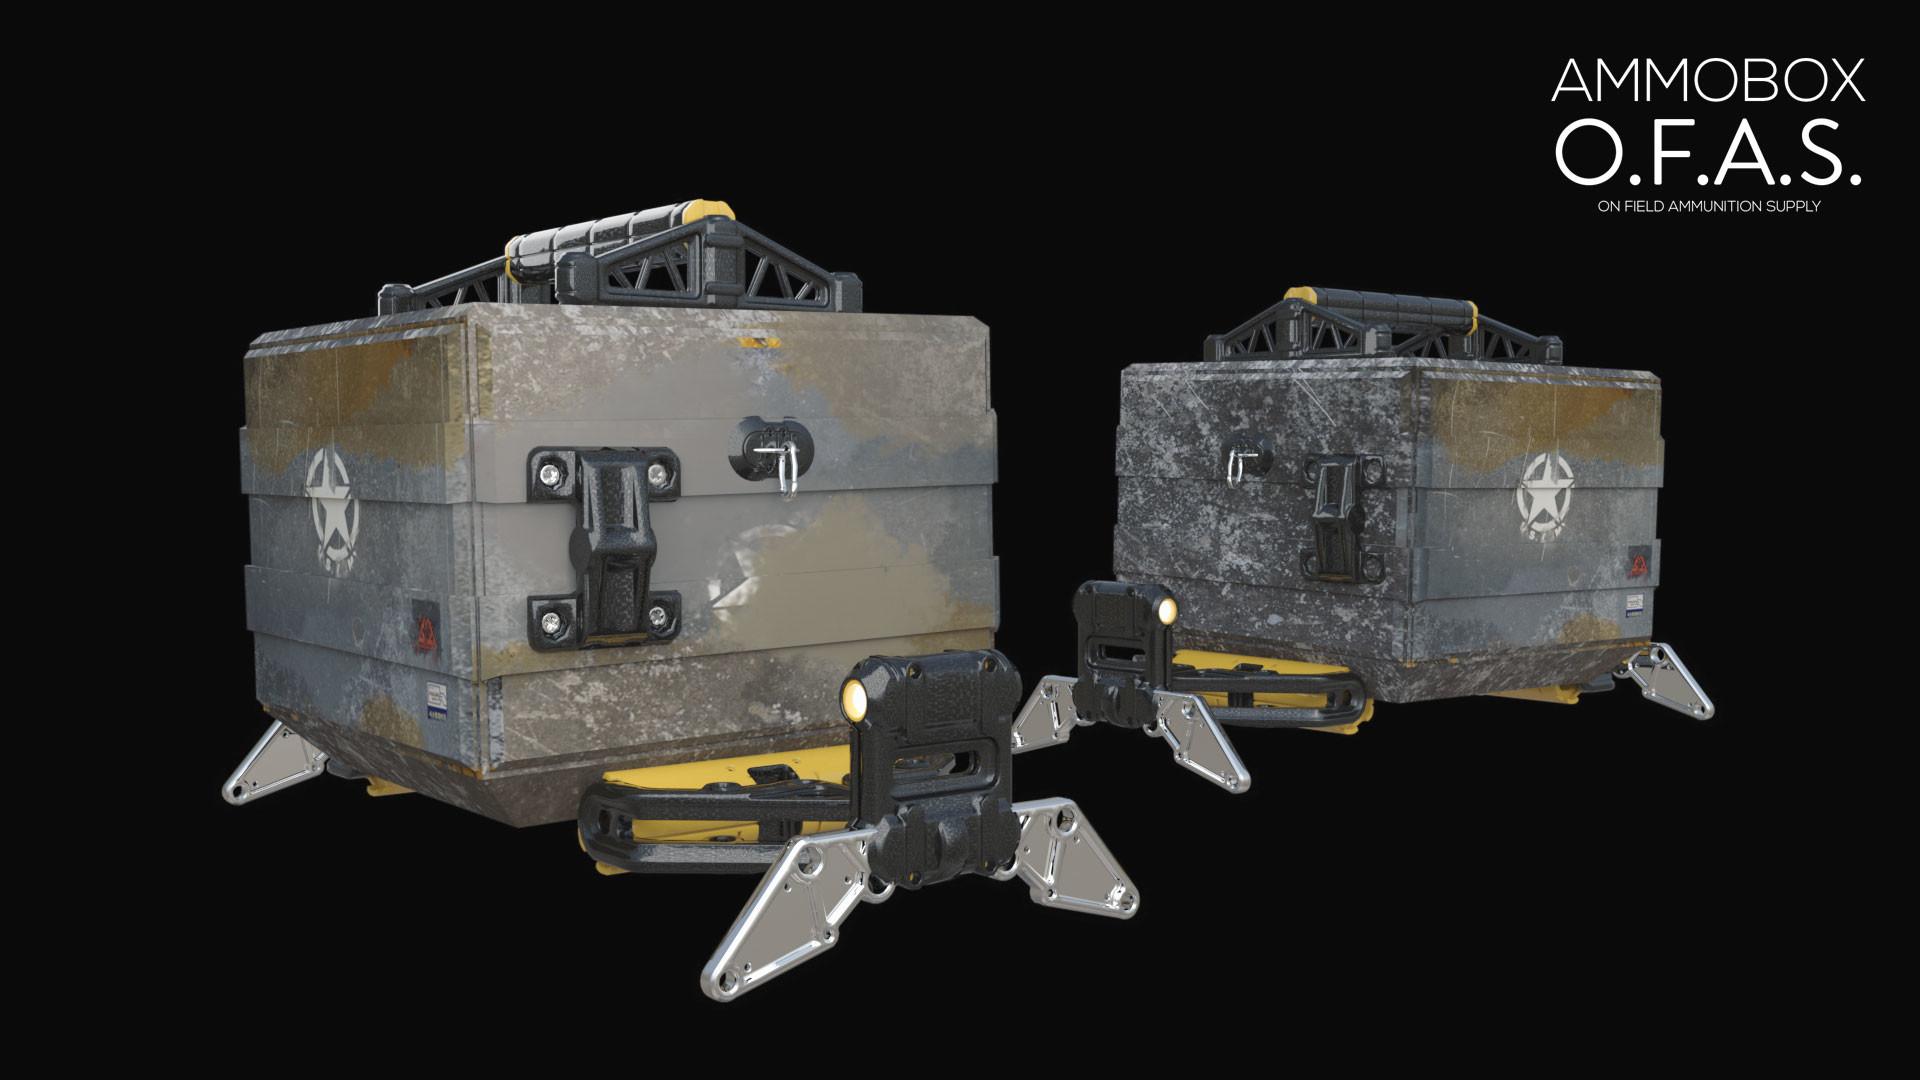 Michelangelo girardi ammobox3